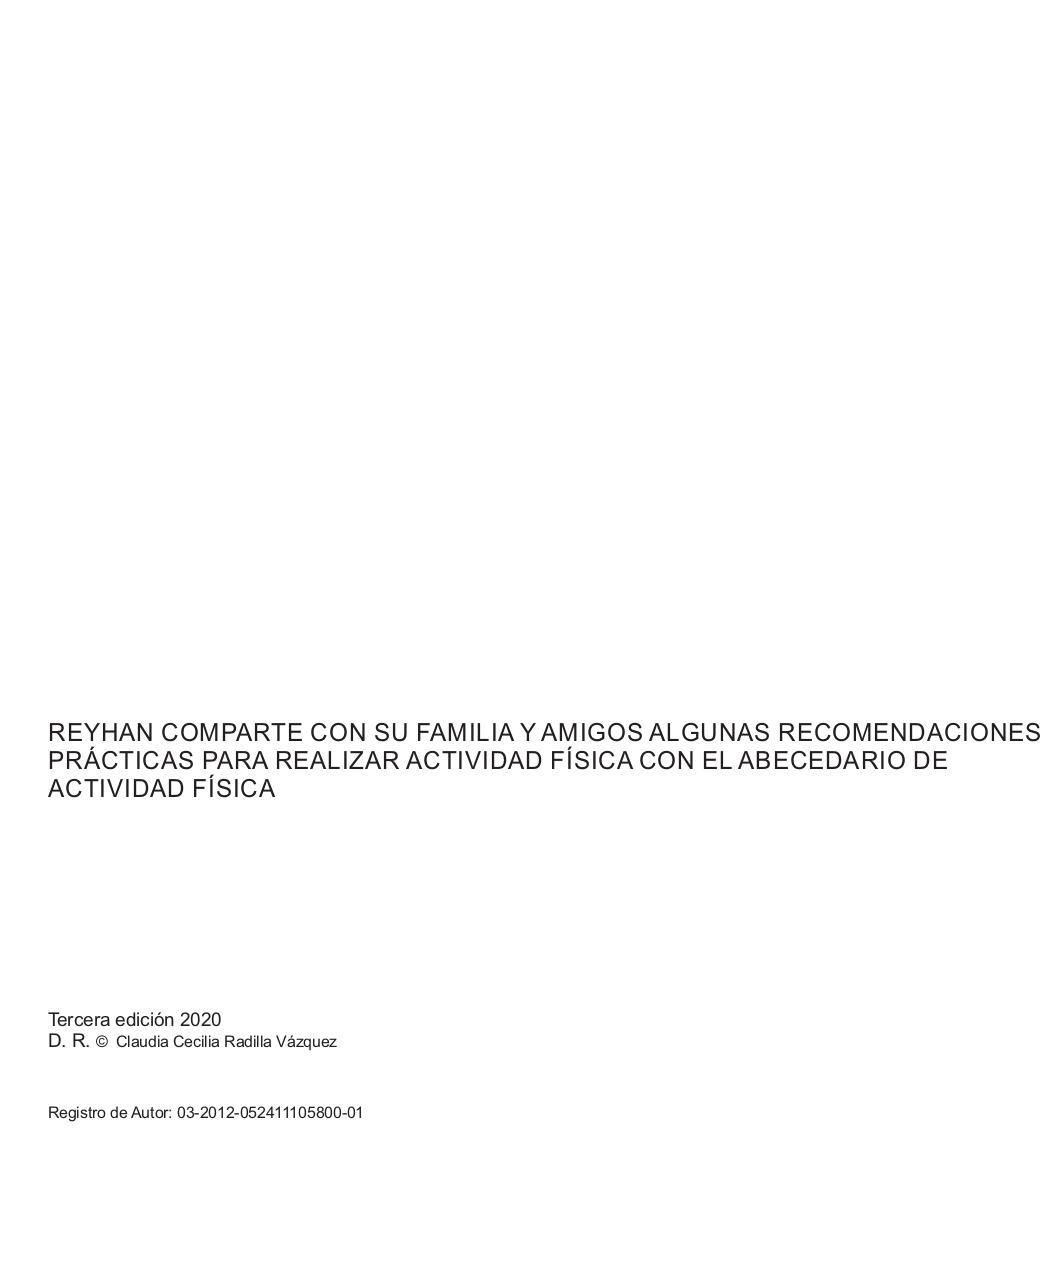 ABC Activfis Reyhan digital_page-0003